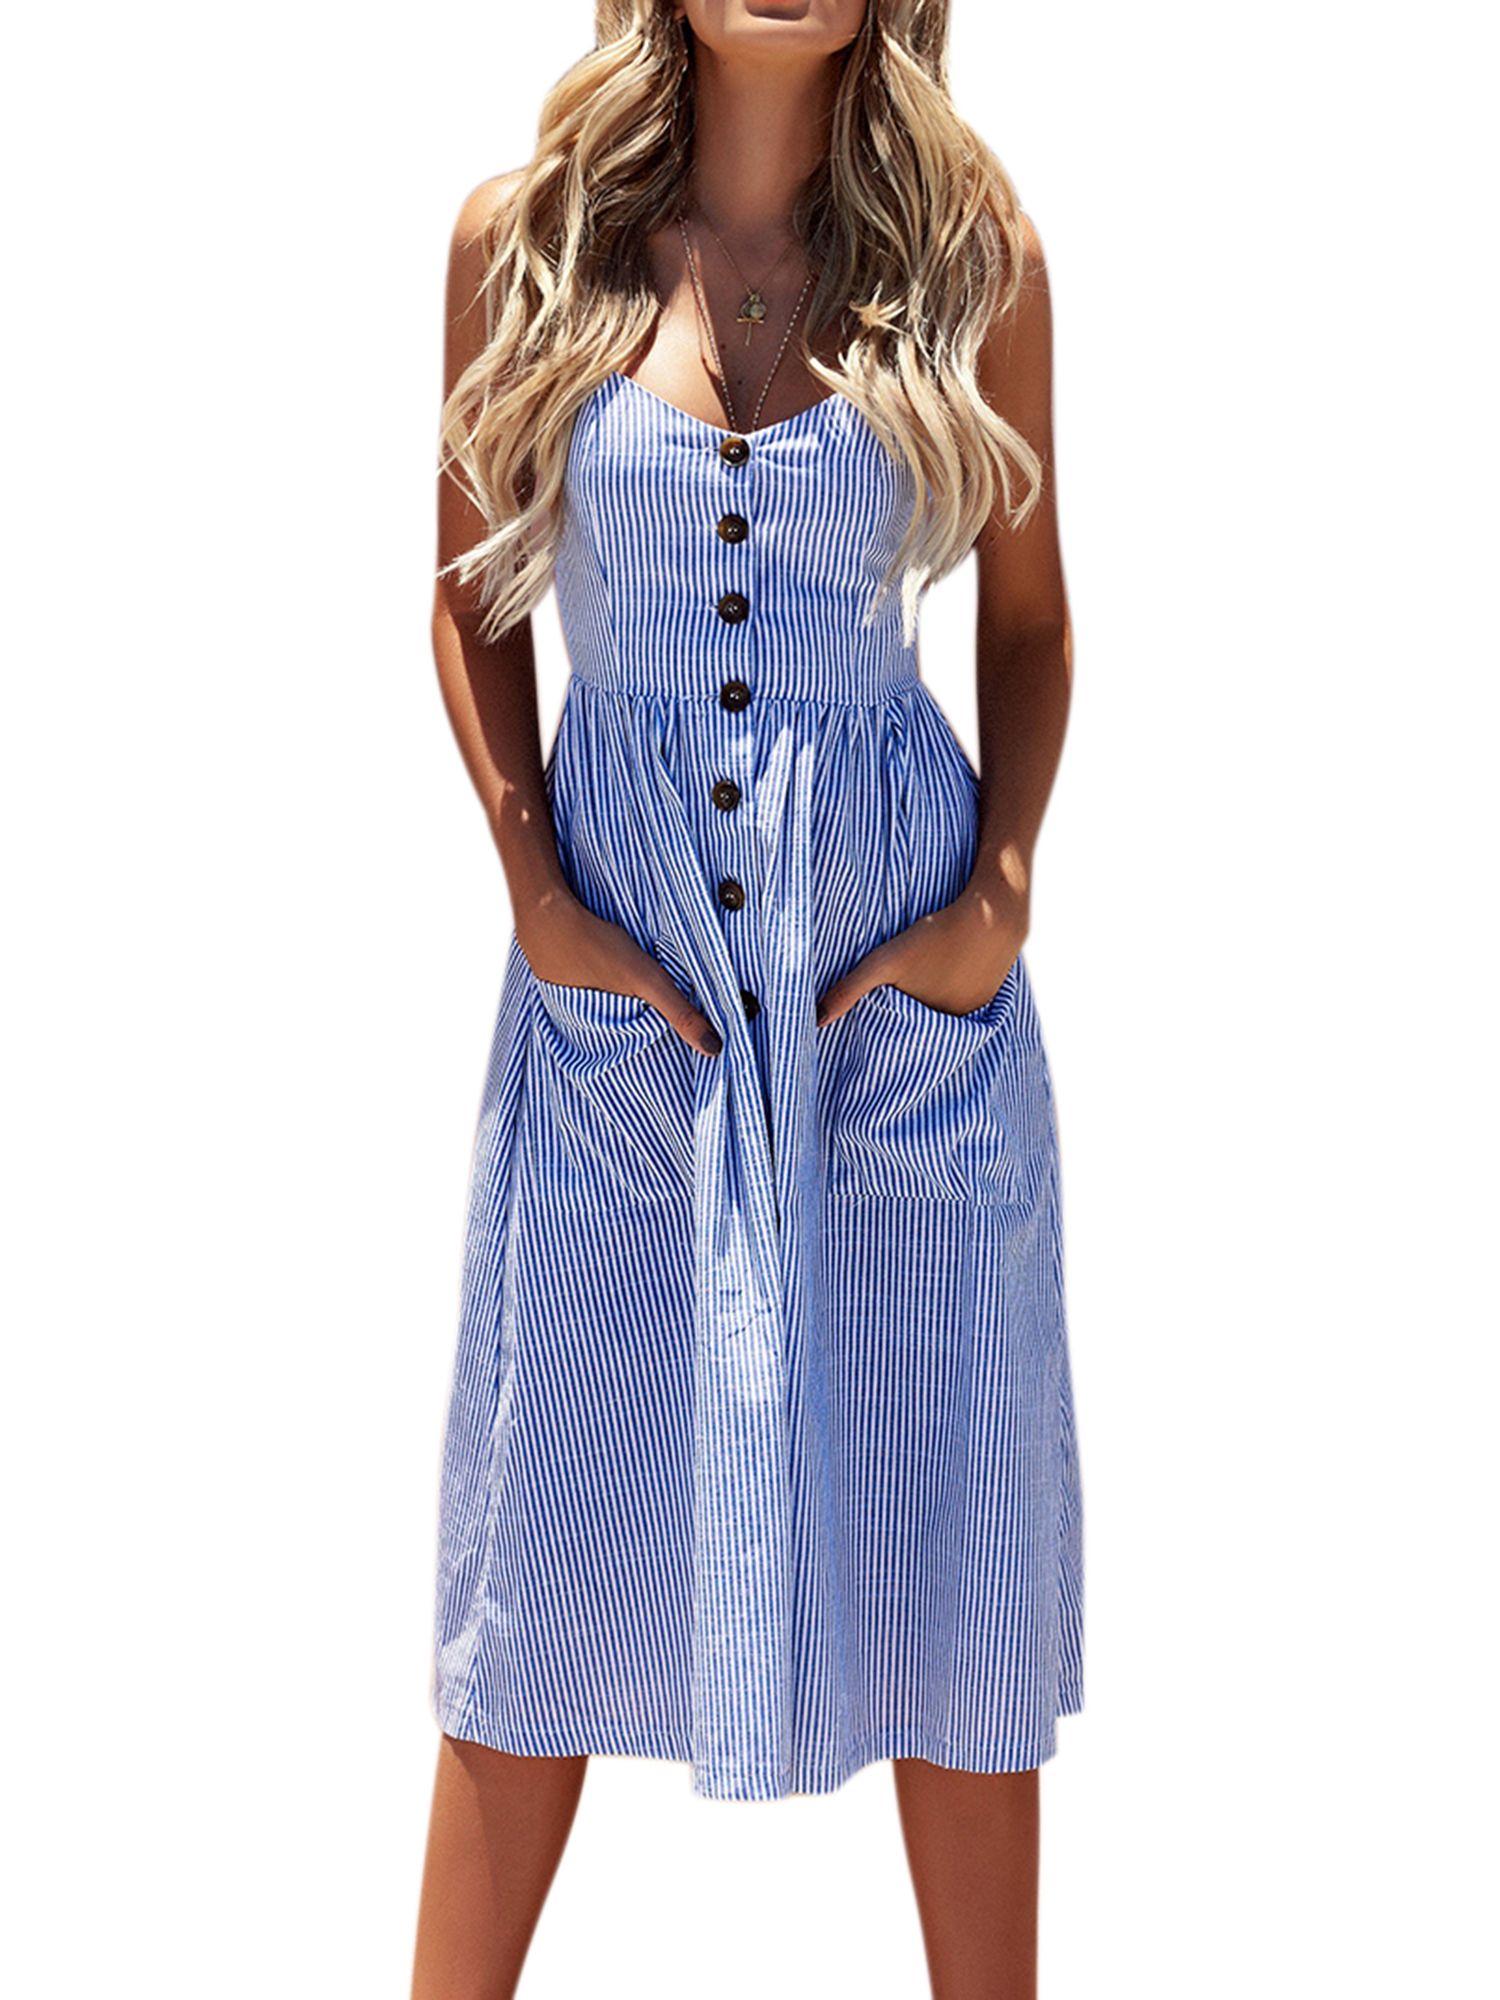 Free 2 Day Shipping Buy Womens Summer Holiday Beach Bardot Button Through Ladies Sling Long Smock Summer Dresses For Women Beach Dresses Summer Summer Dresses [ 2000 x 1500 Pixel ]